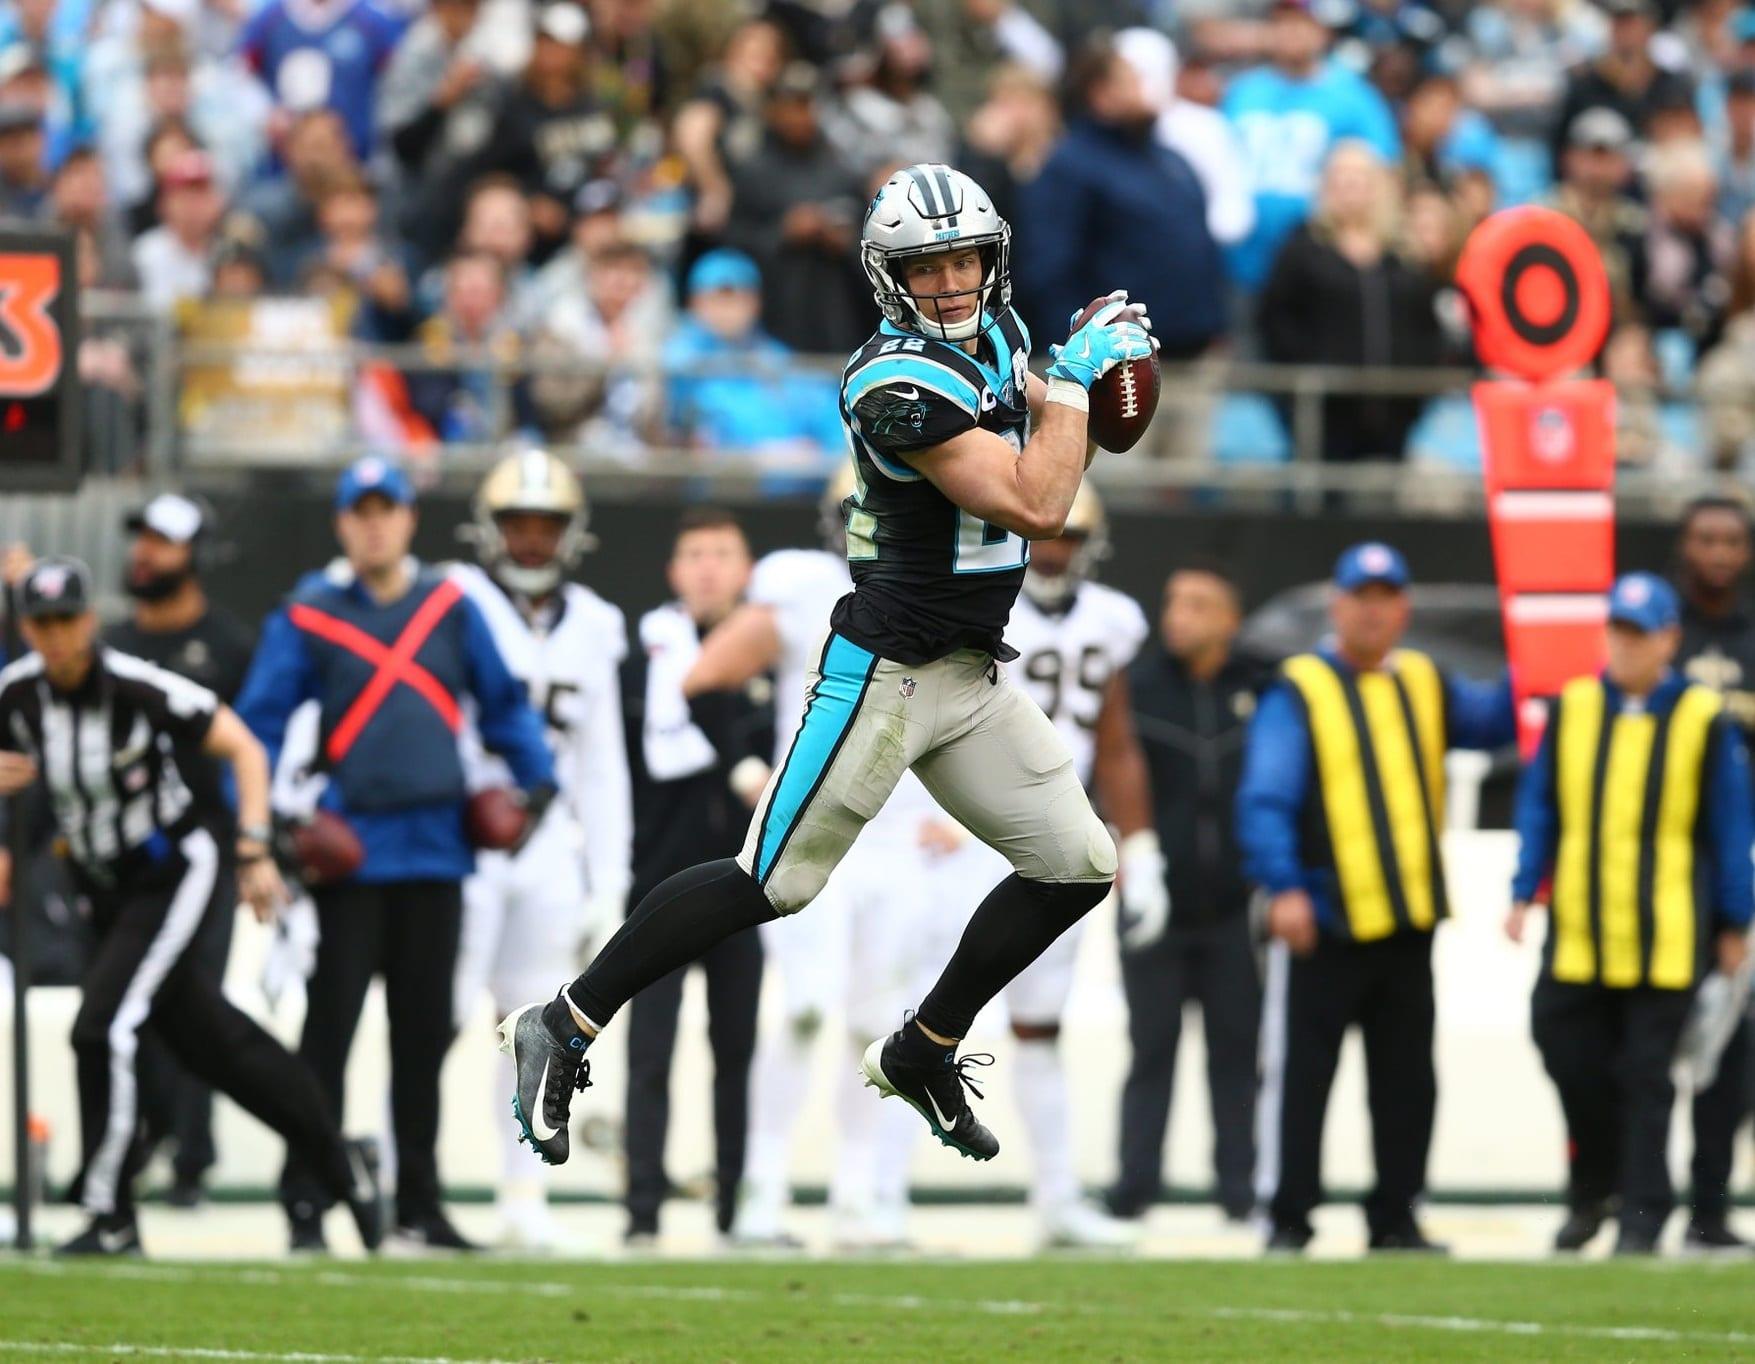 Christian McCaffrey, running back do Carolina Panthers